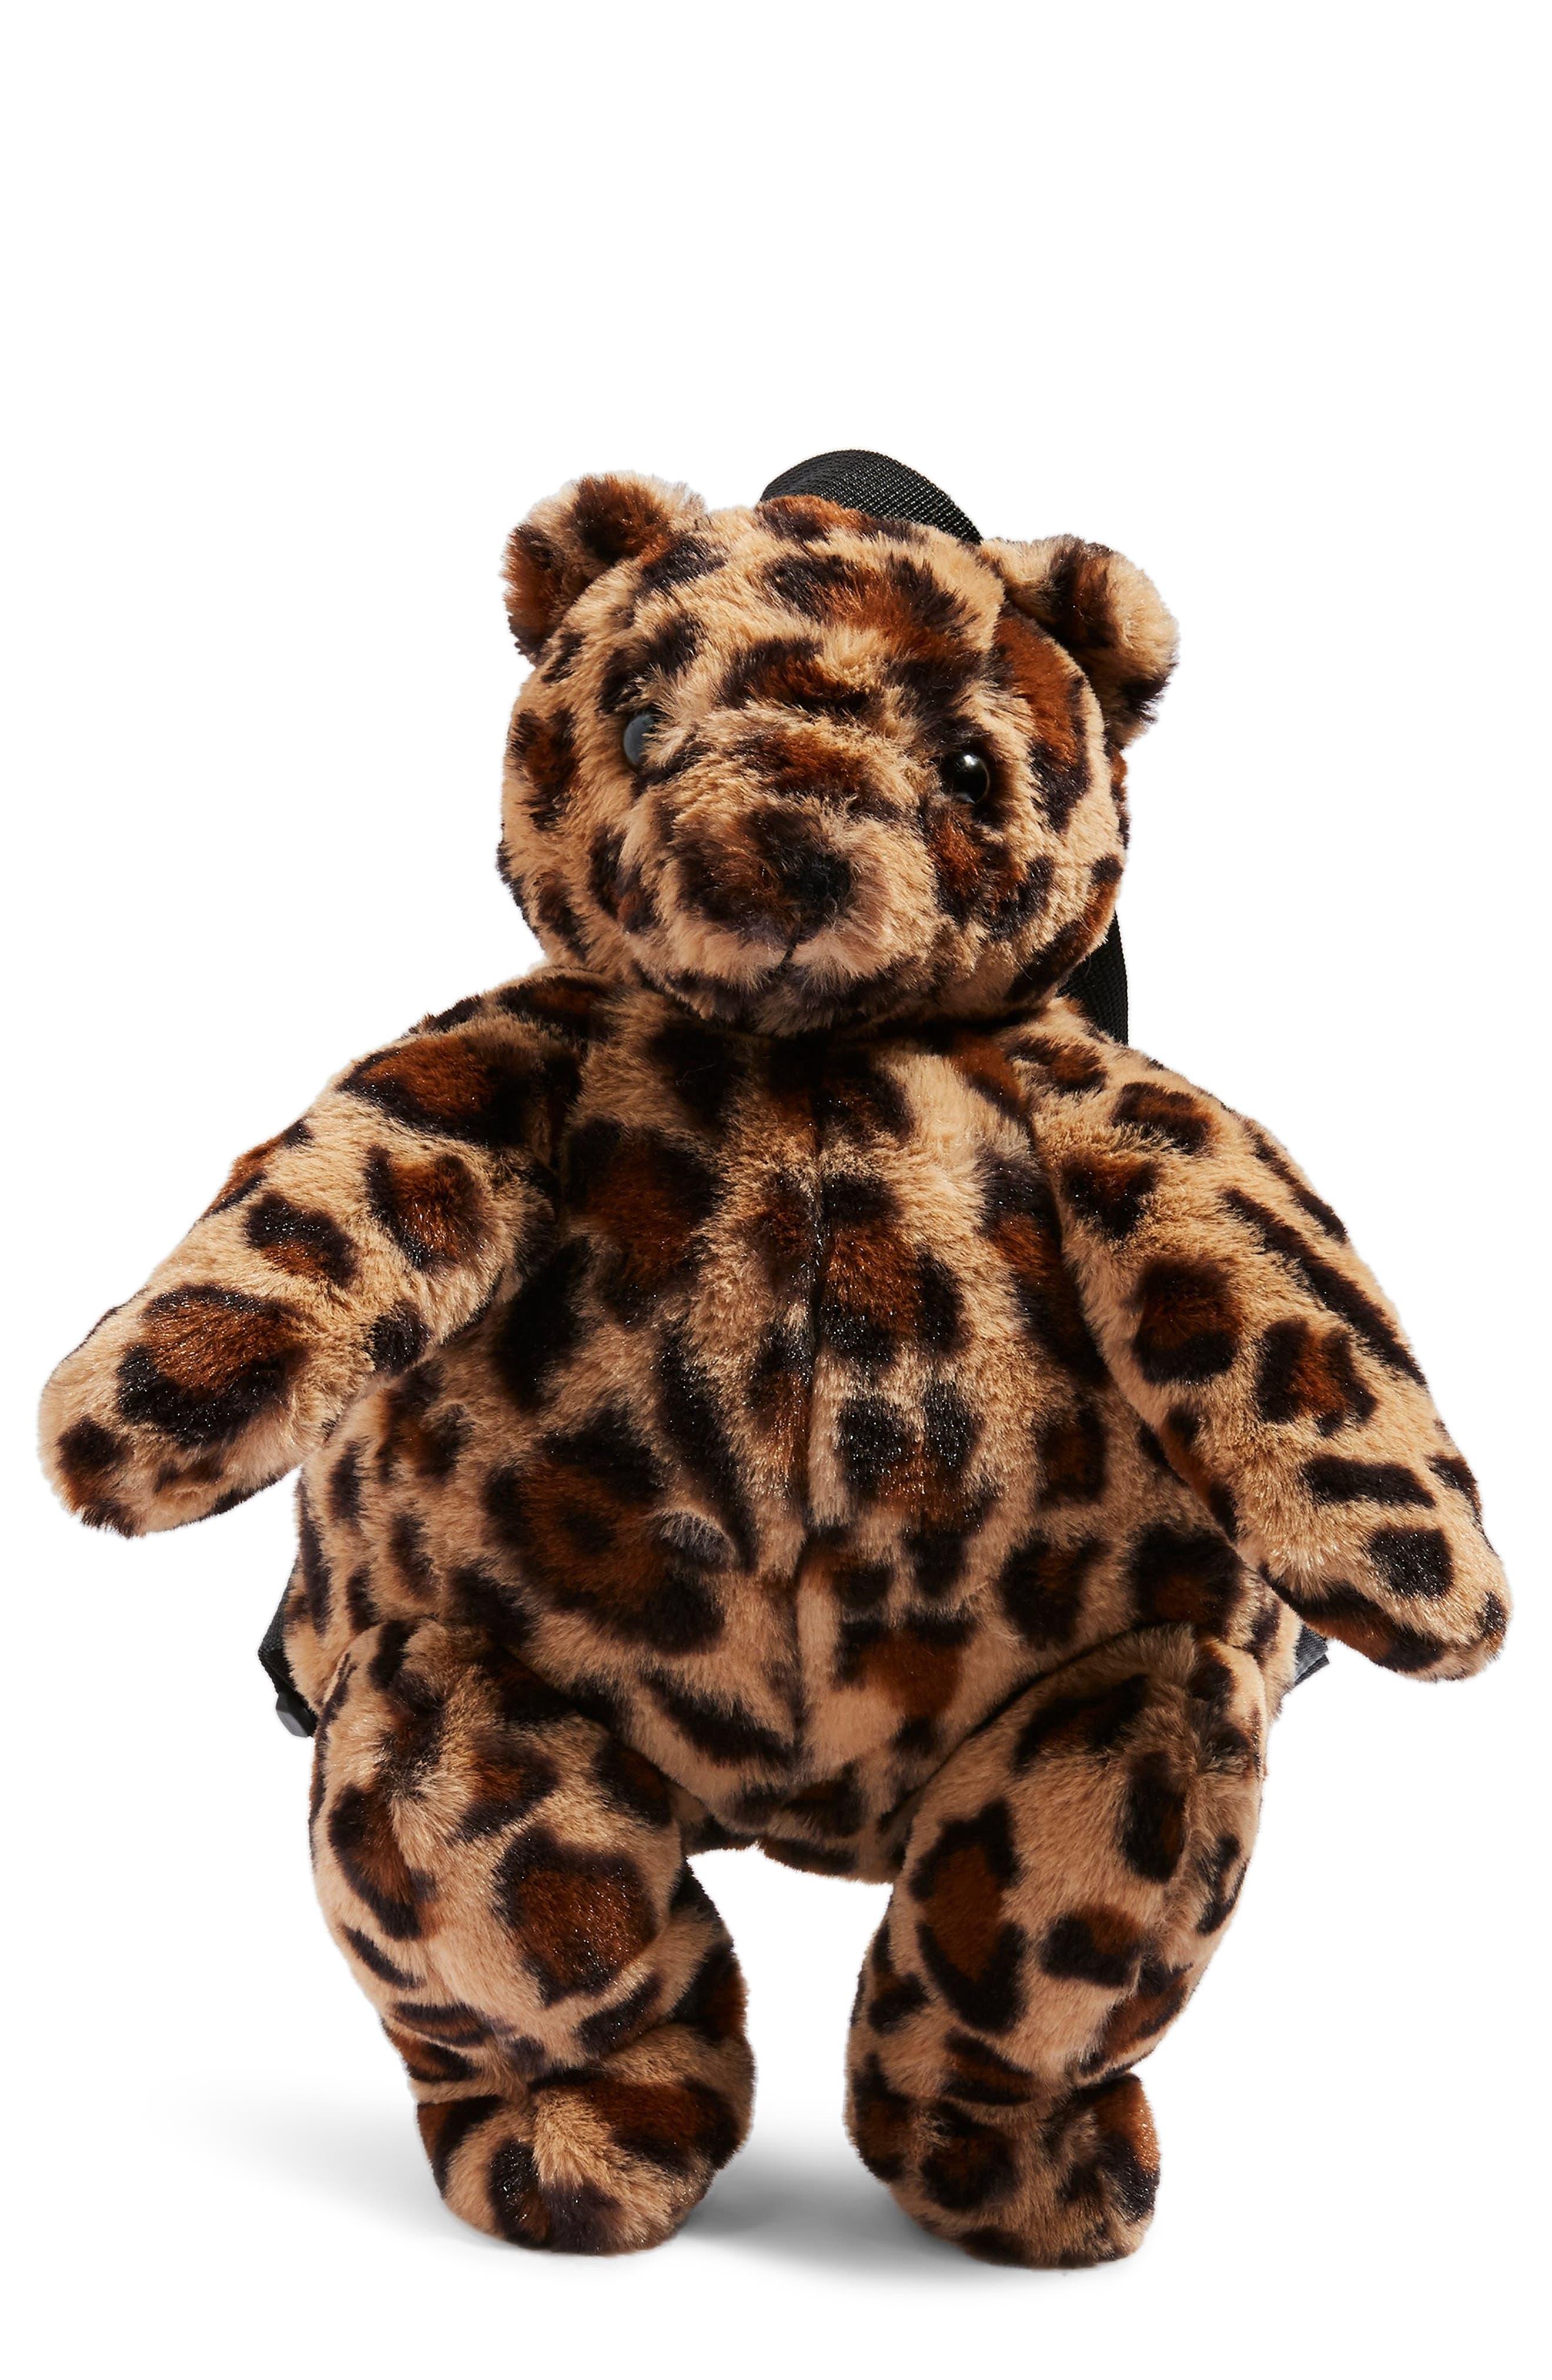 Topshop Faux Fur Teddy Bear Backpack -